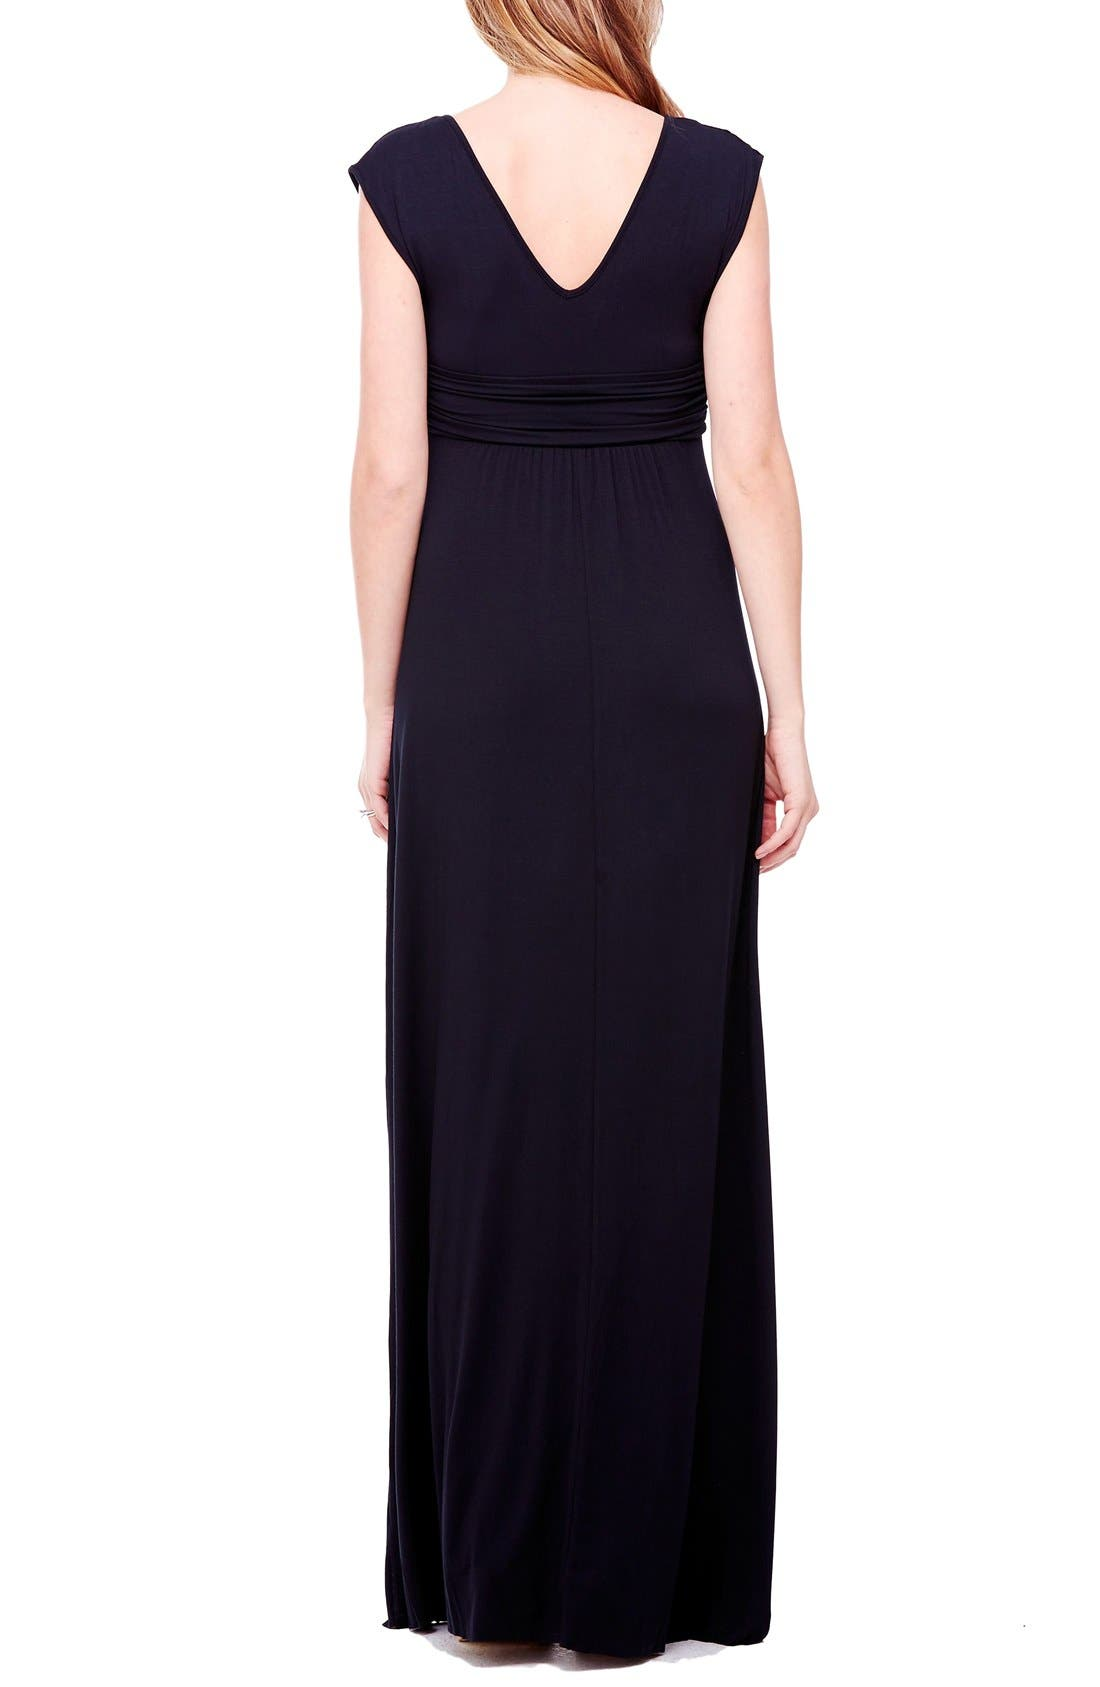 Empire Waist Maternity Maxi Dress,                             Alternate thumbnail 4, color,